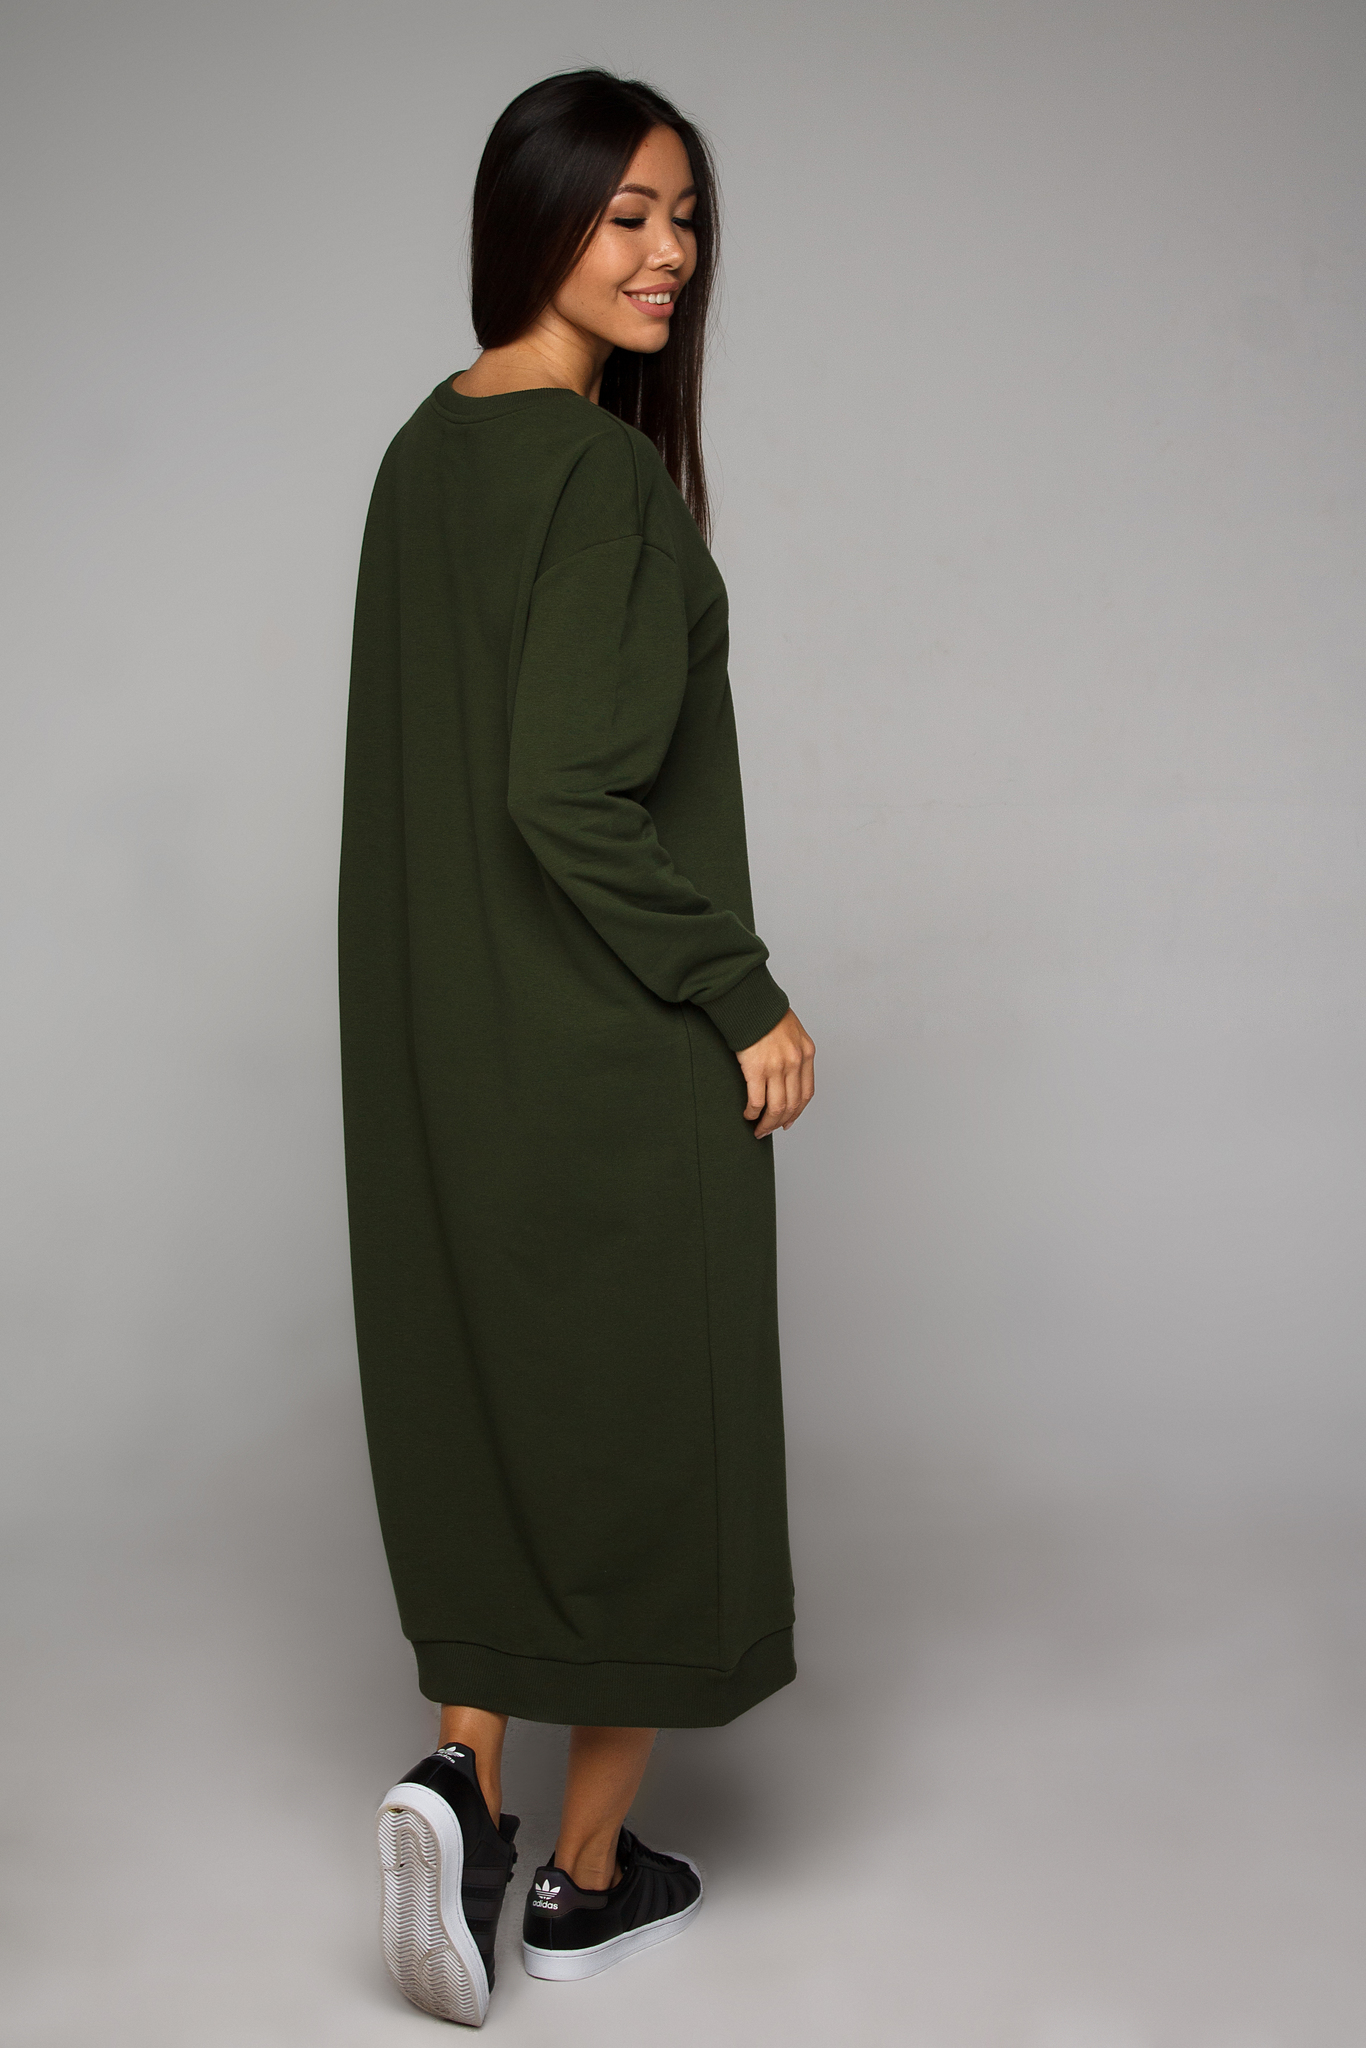 Платье-свитшот оливковое YOS от украинского бренда Your Own Style